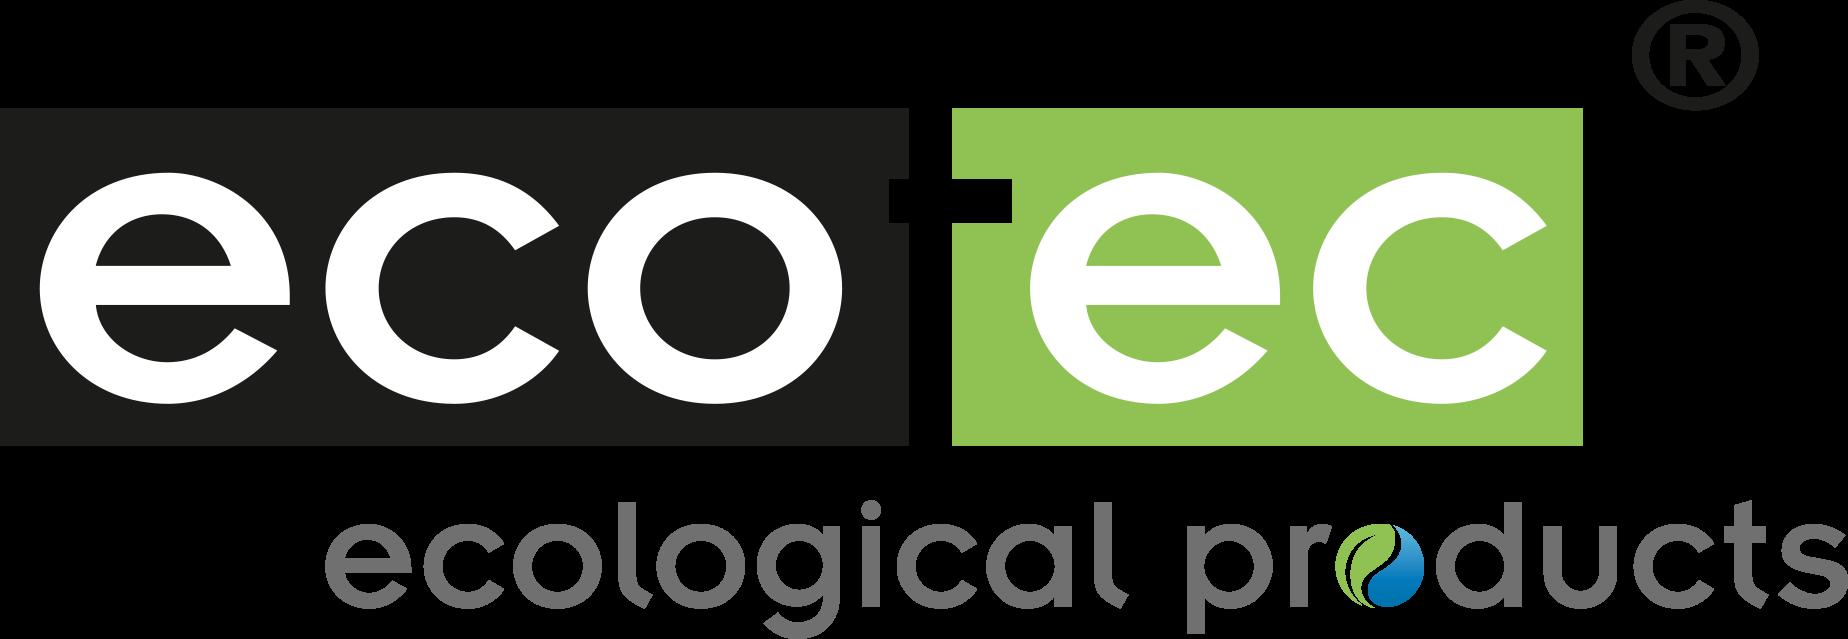 Ecotec Products